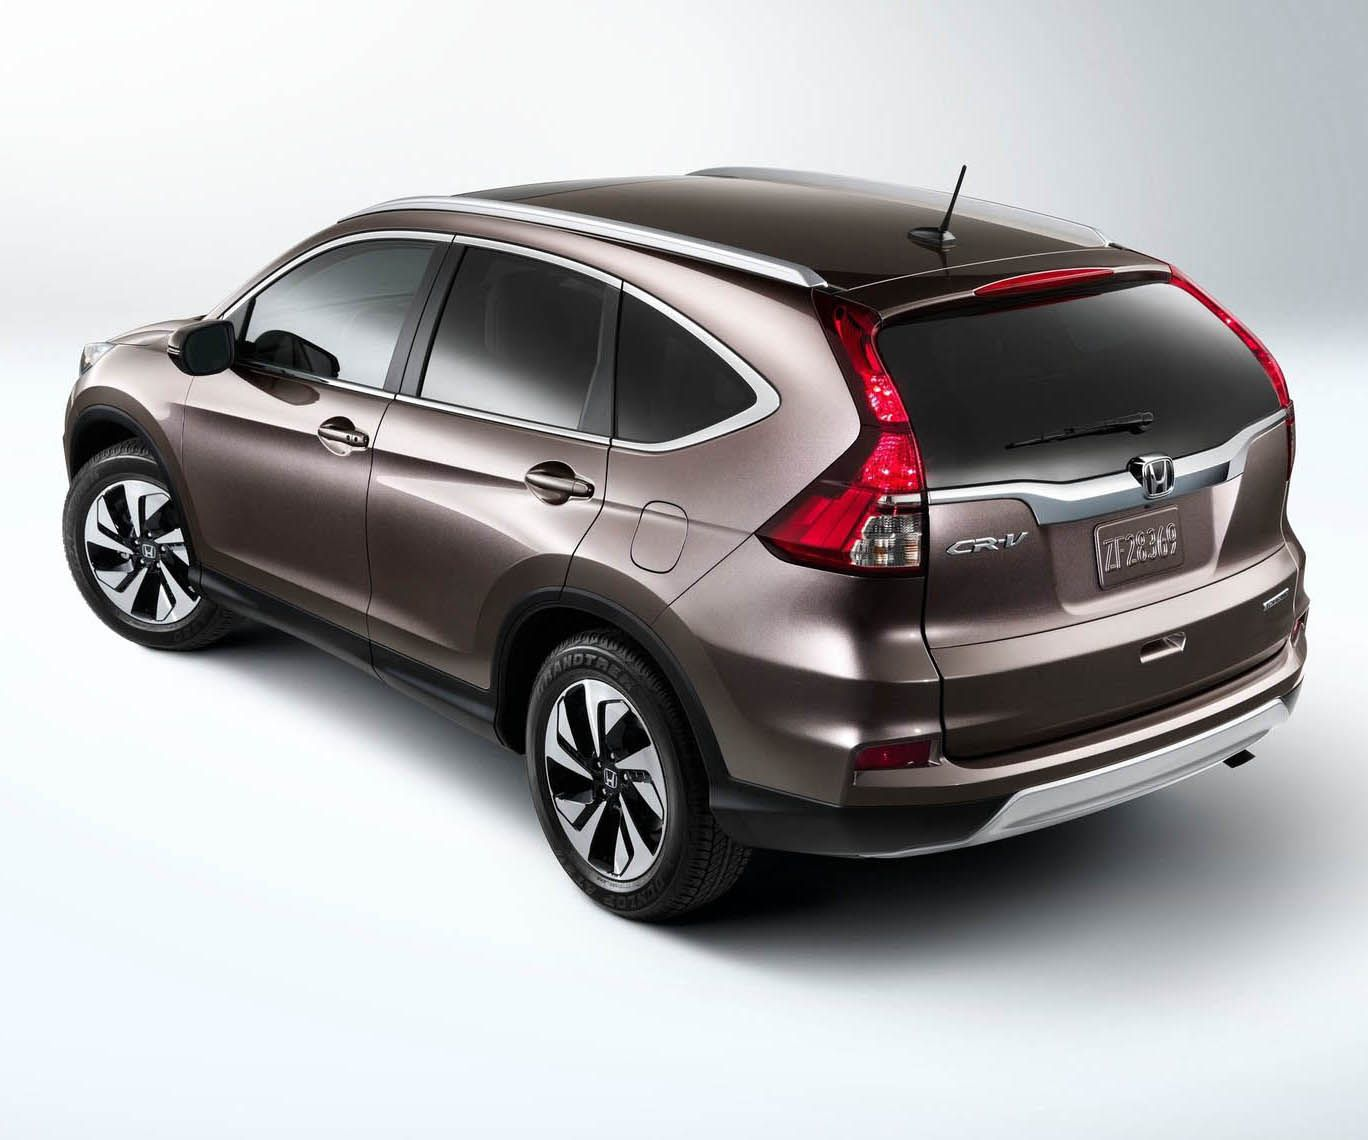 2017 Honda Crv Redesign Jpg 1368 1140